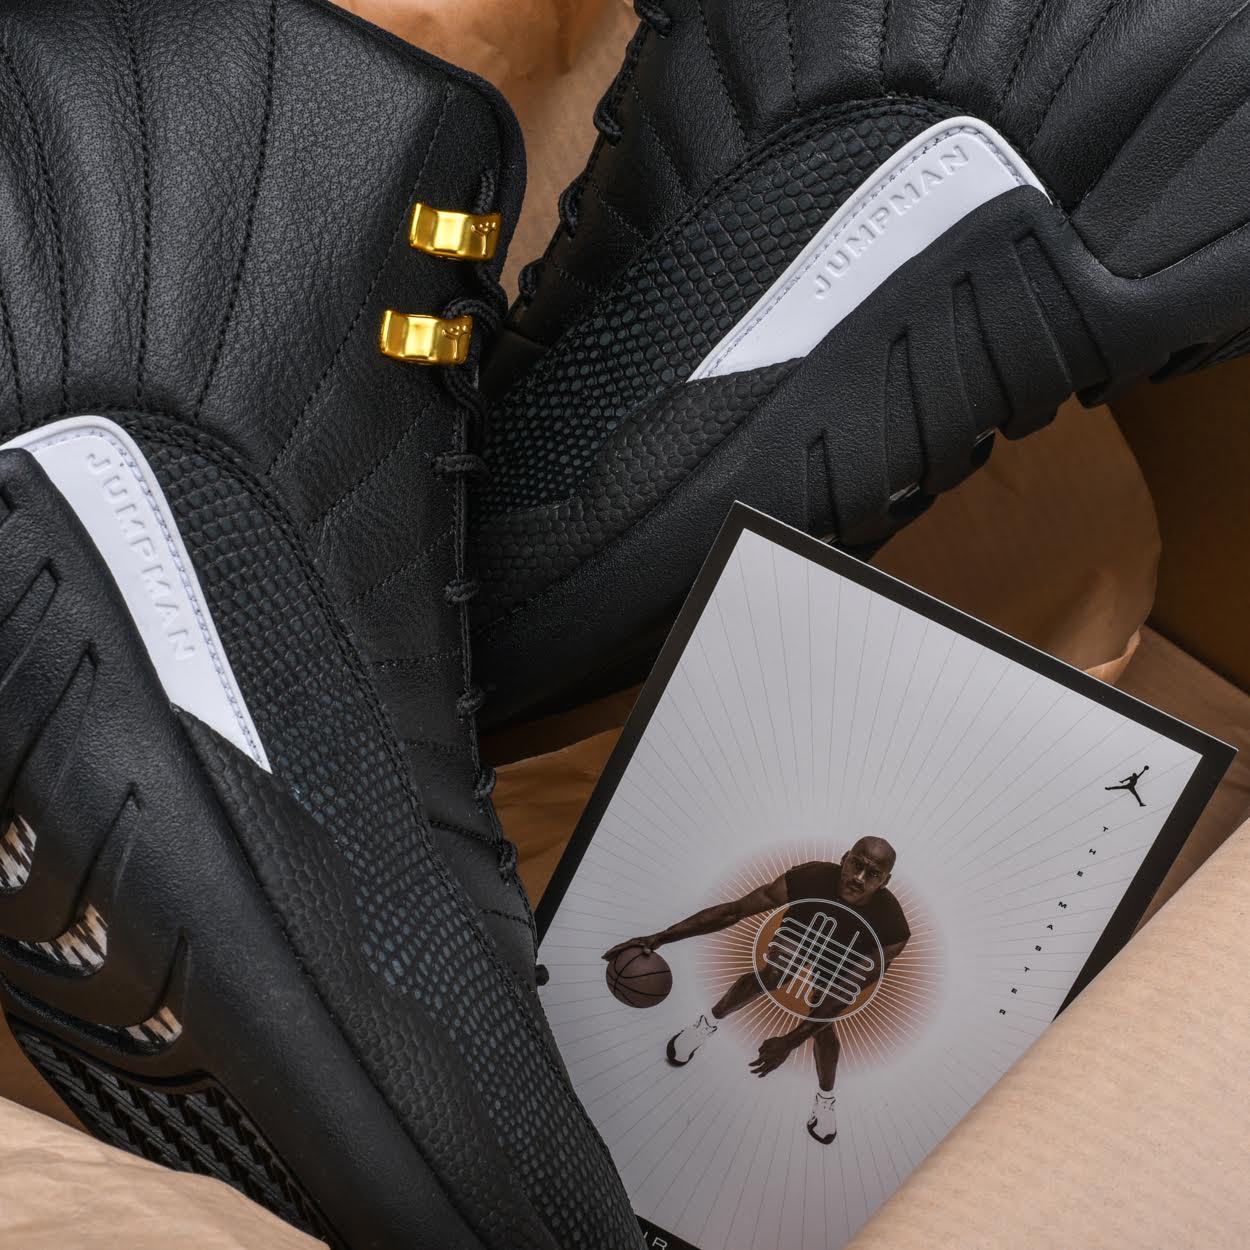 Get One Last Look at the Air Jordan 12 Retro 'The Master' 8